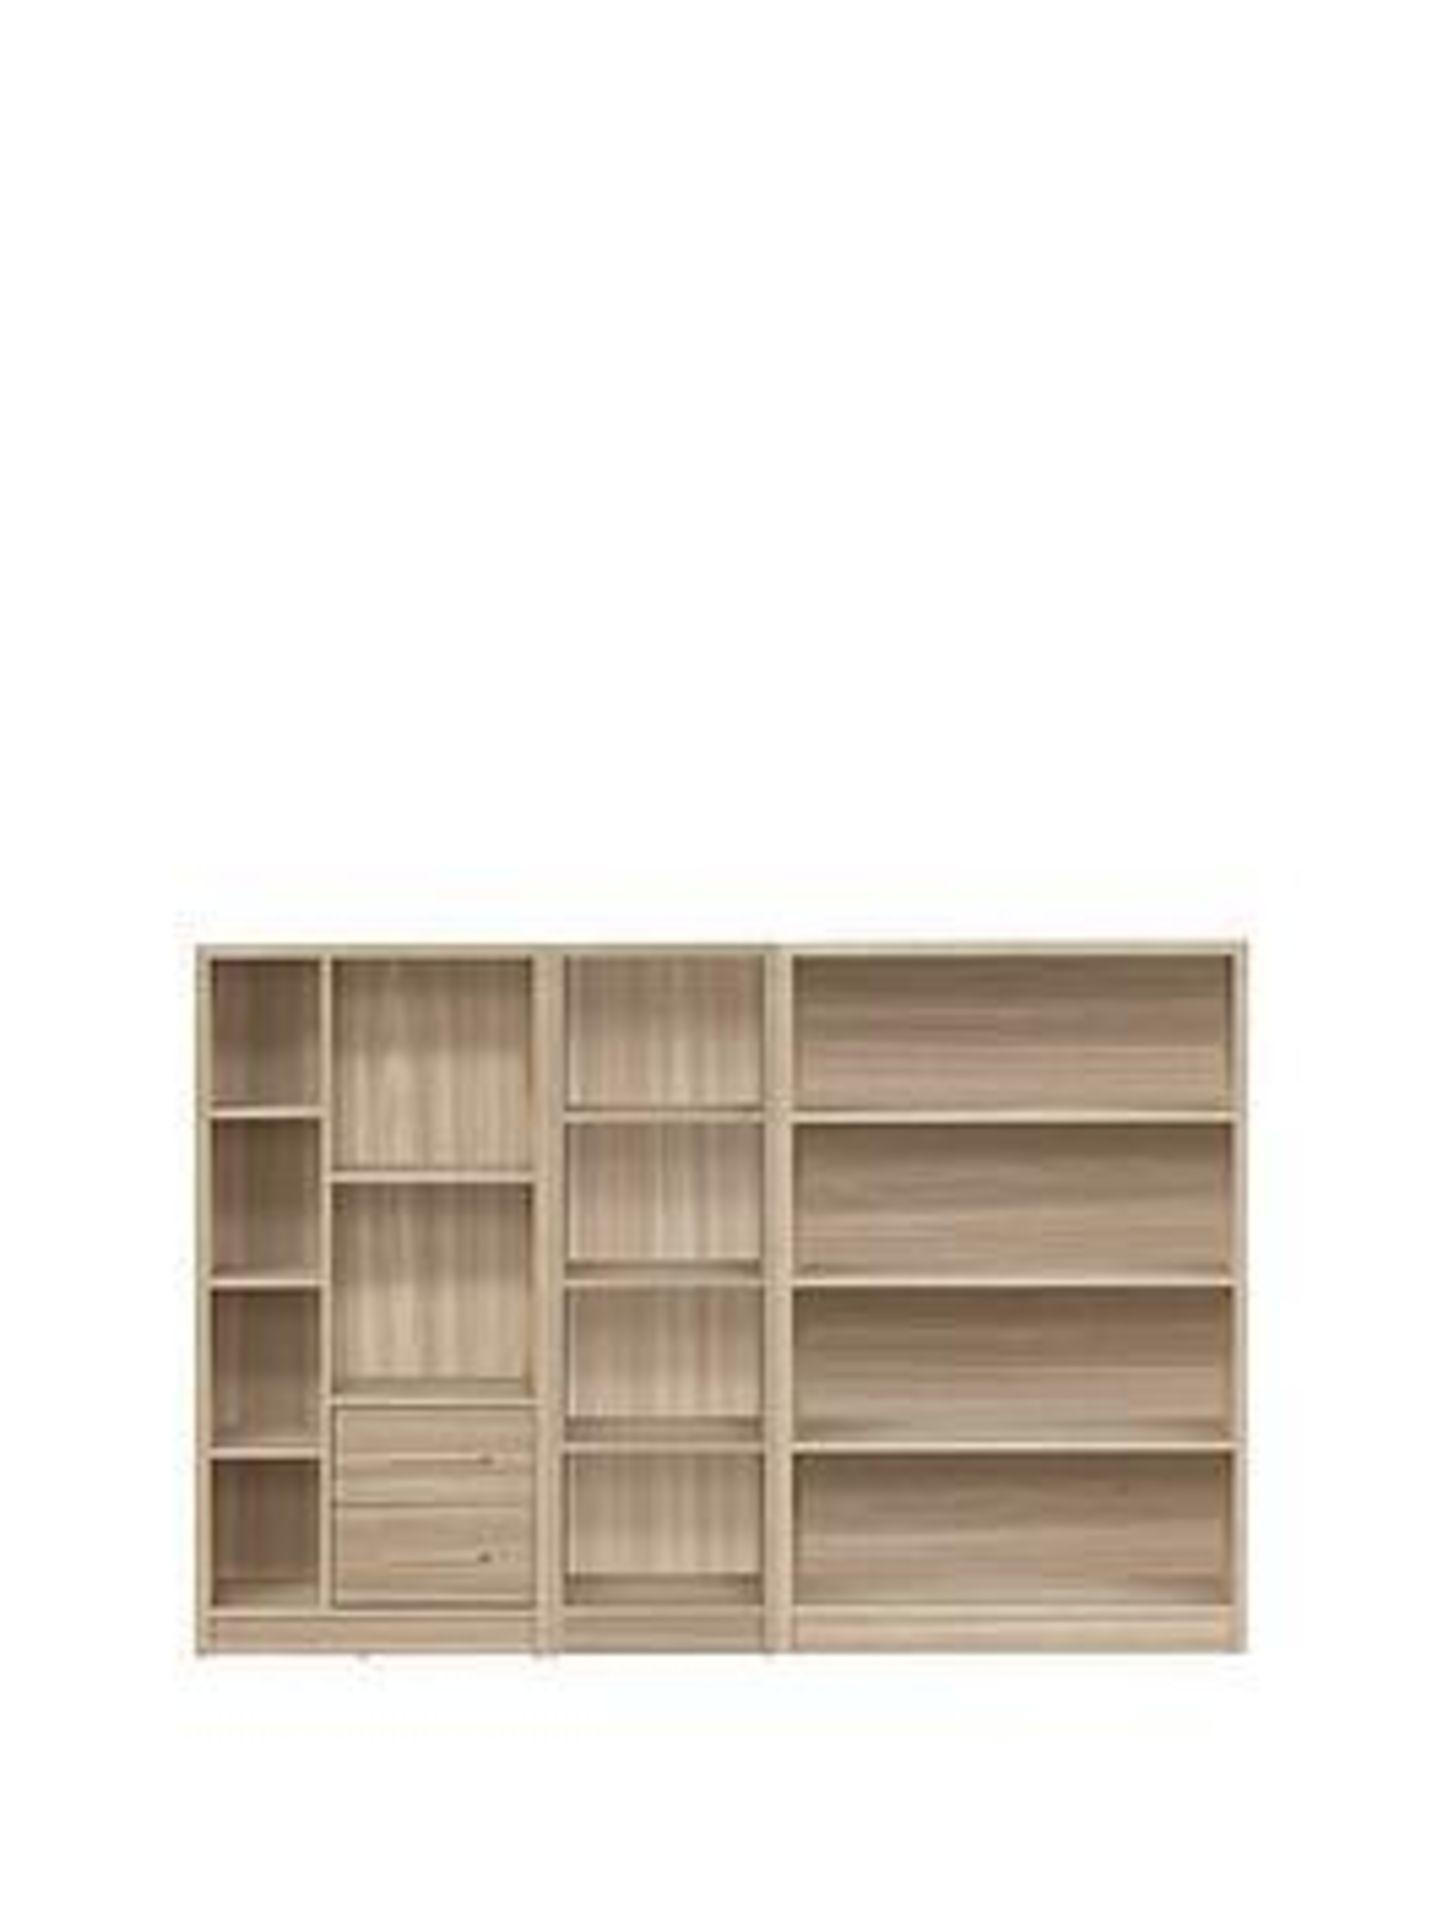 Lot 50 - Boxed Item Metro 3 Piece Bookcase [Oak] 121X79X30Cm rrp, £226.0